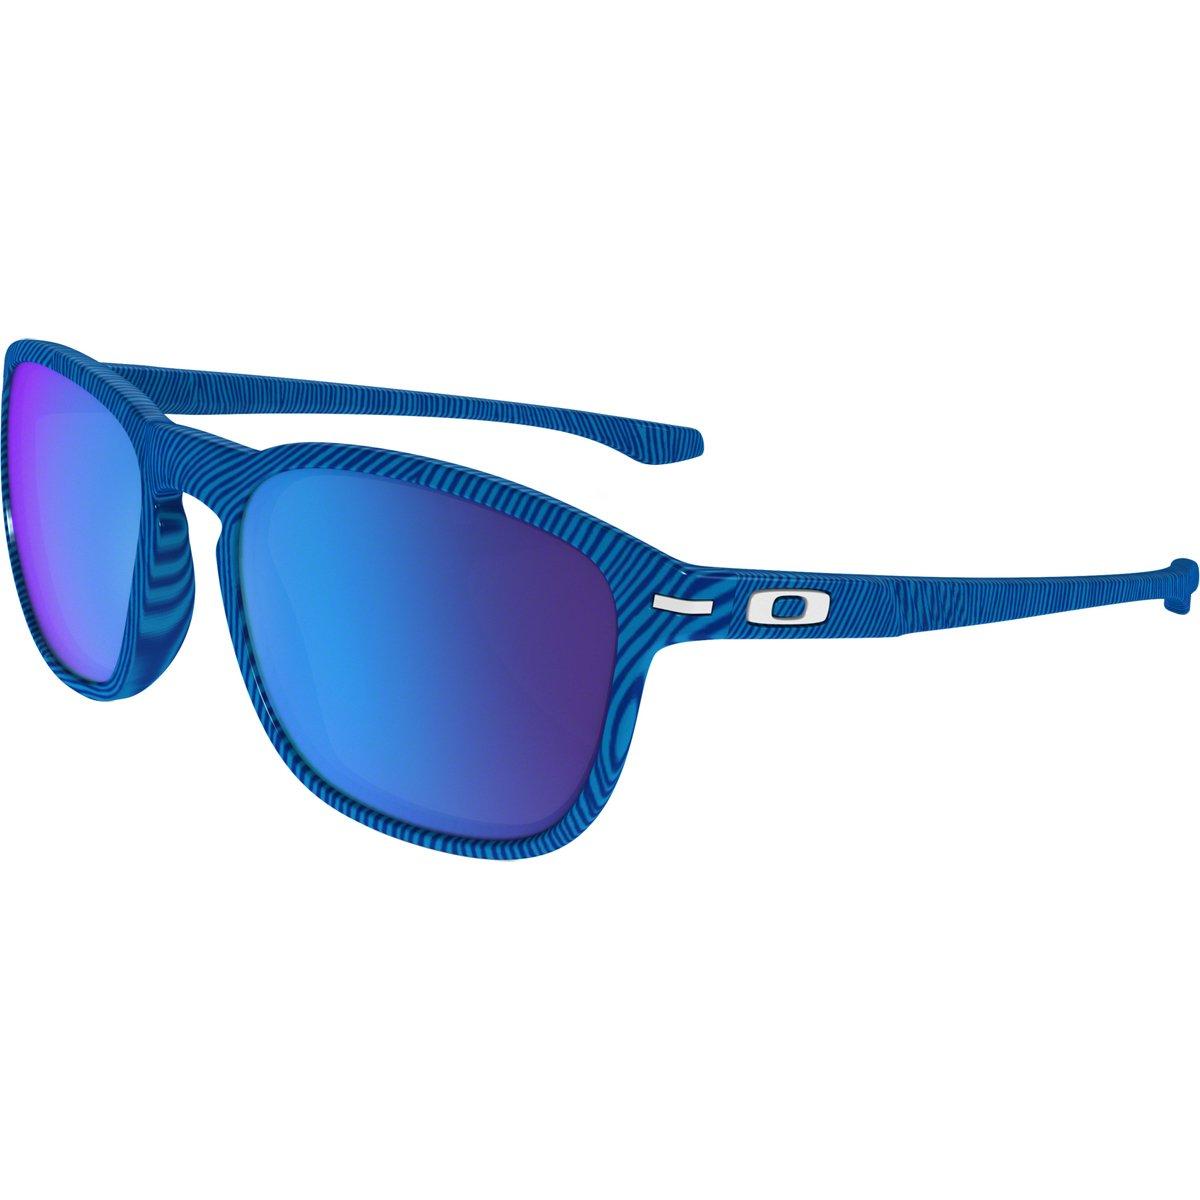 Amazon.com: Oakley Shaun White Gold Series Enduro – Gafas de ...